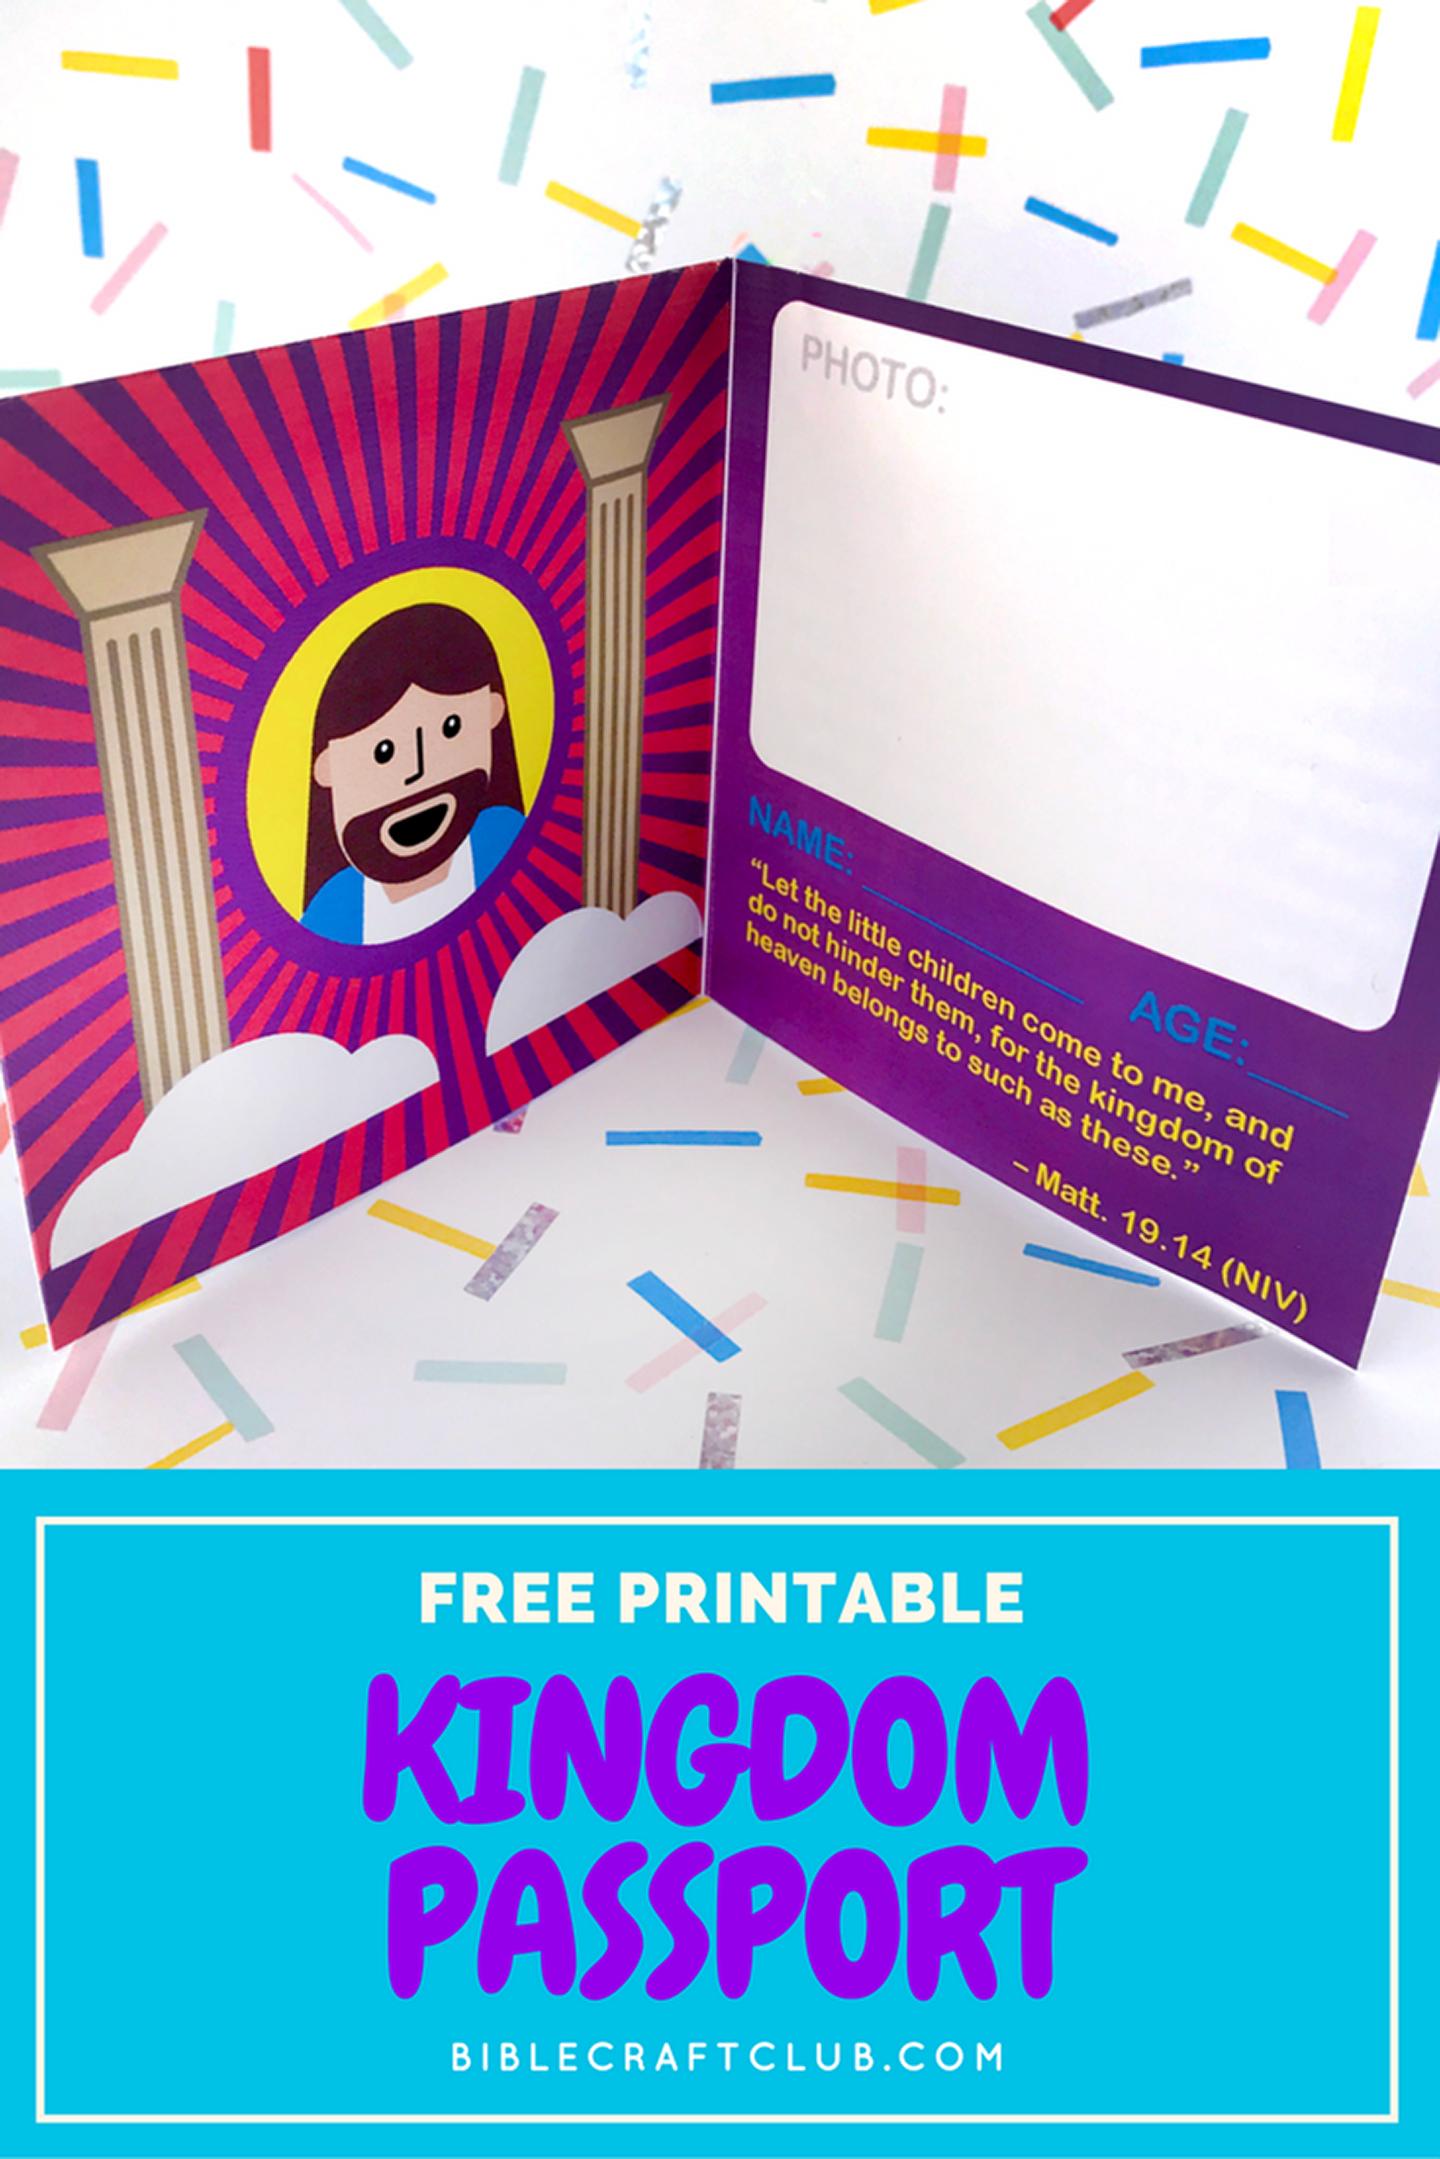 Kingdom Passport Craft | Biblecraftclub | Bible Crafts - Free Printable Bible Crafts For Preschoolers